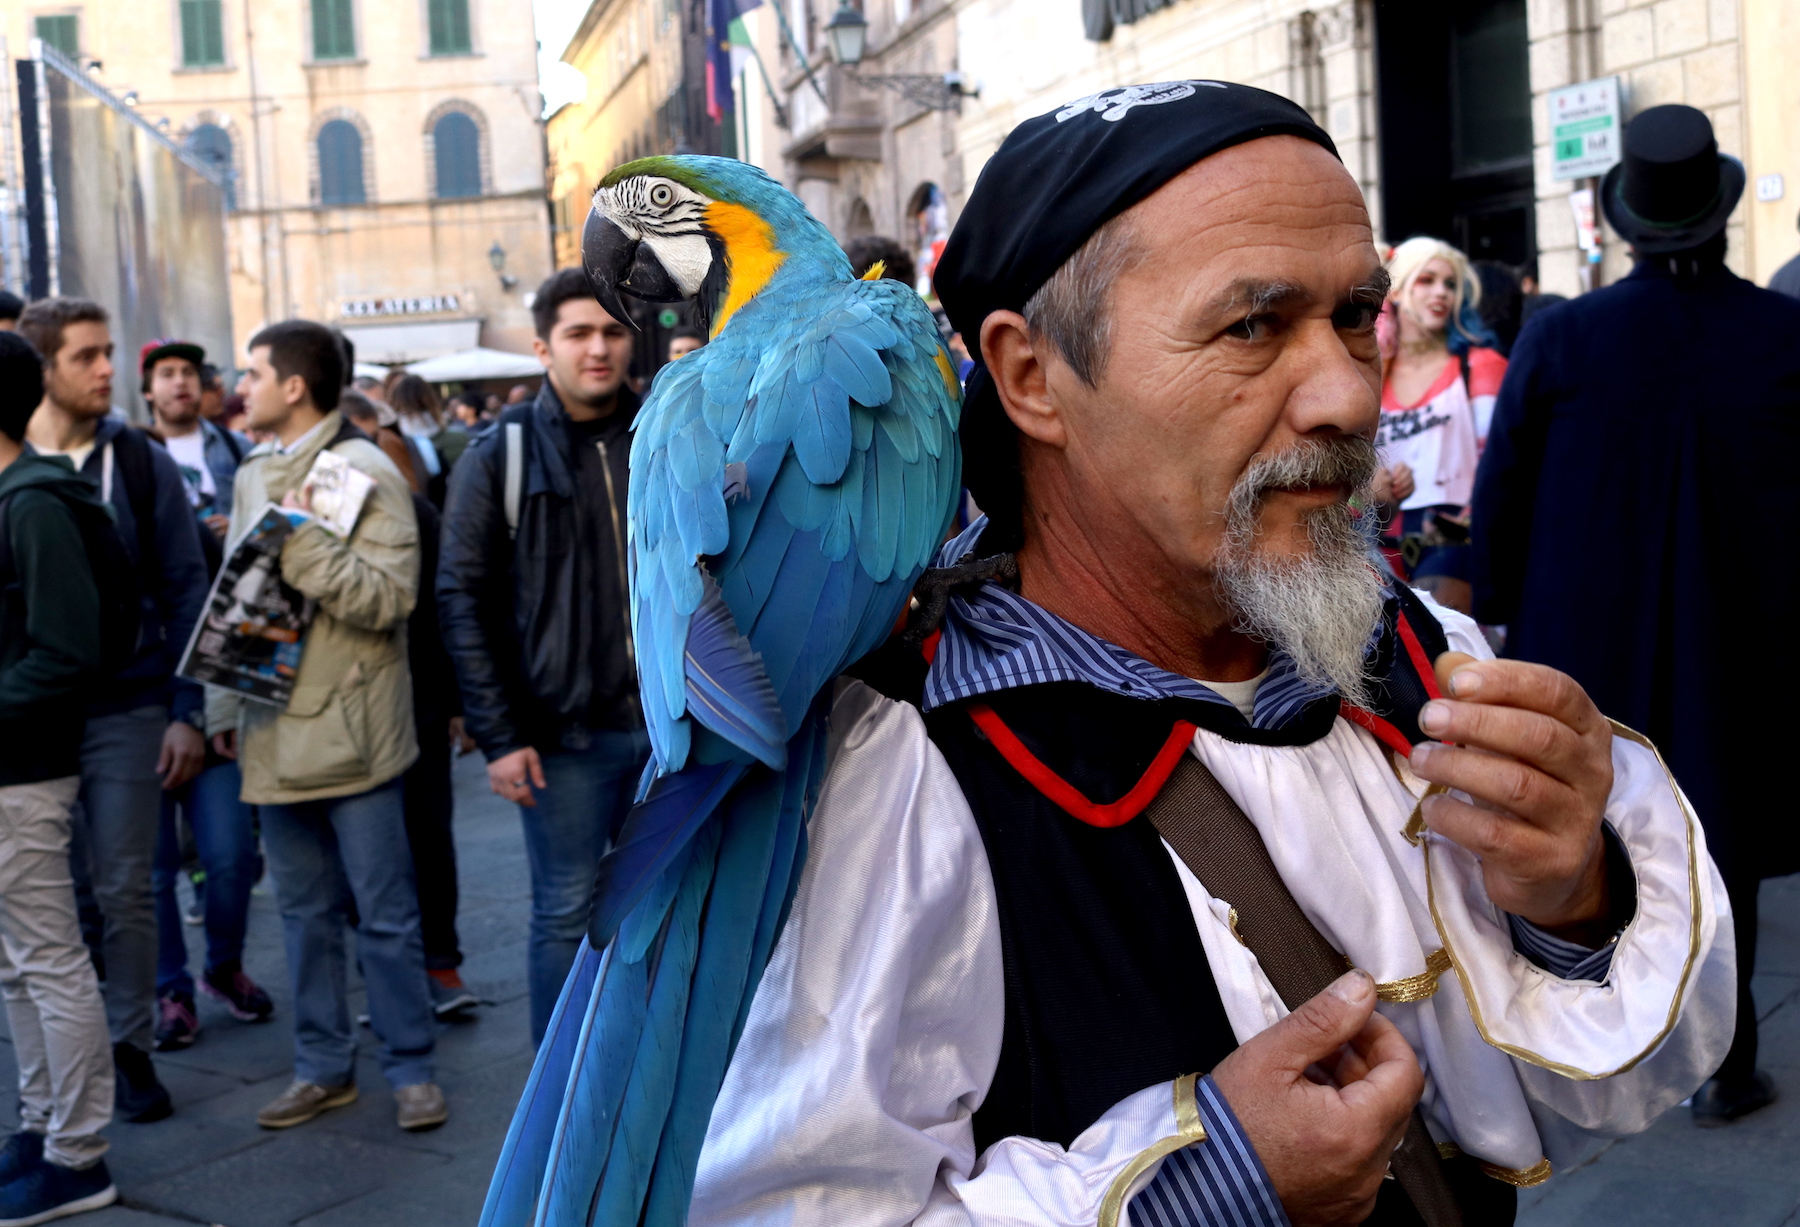 Lucca 2016: bizzarro cosplay